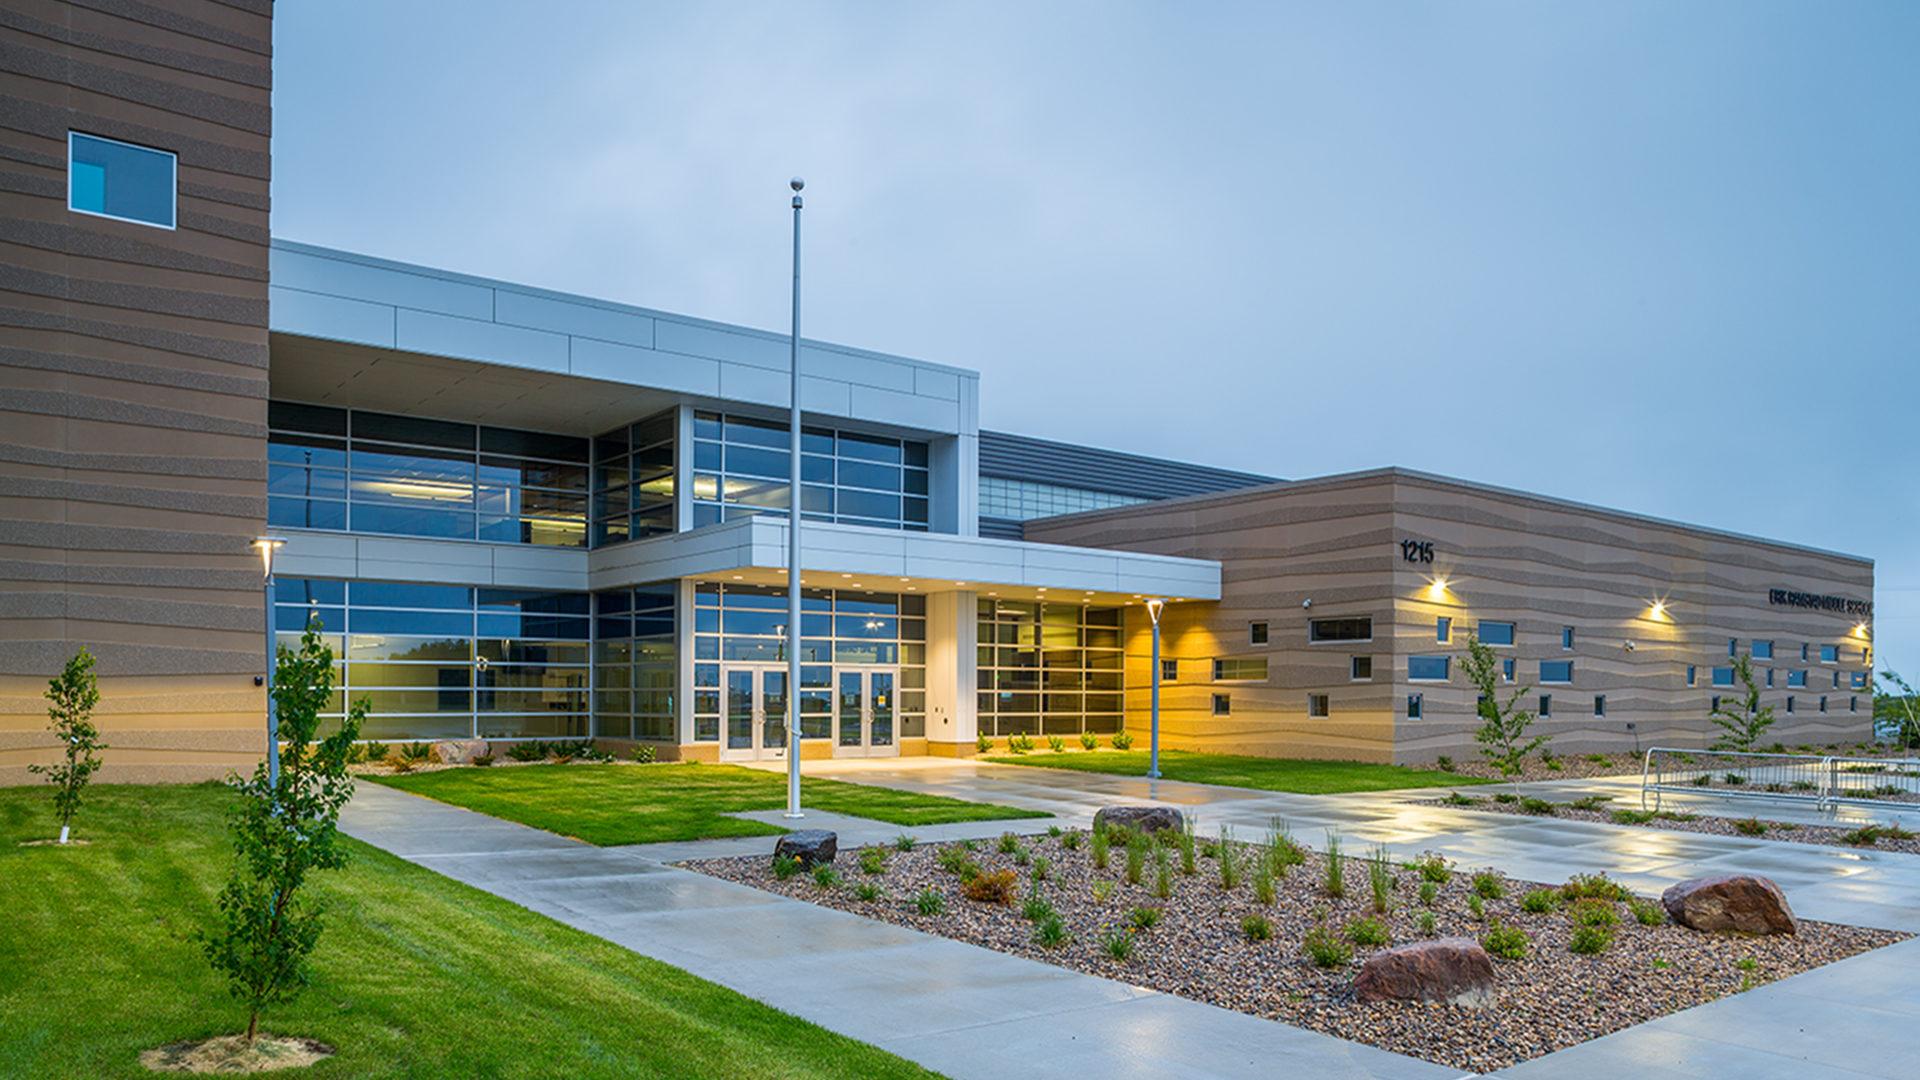 Erik Ramstad Middle School Exterior Dawn Shot of School Entrance